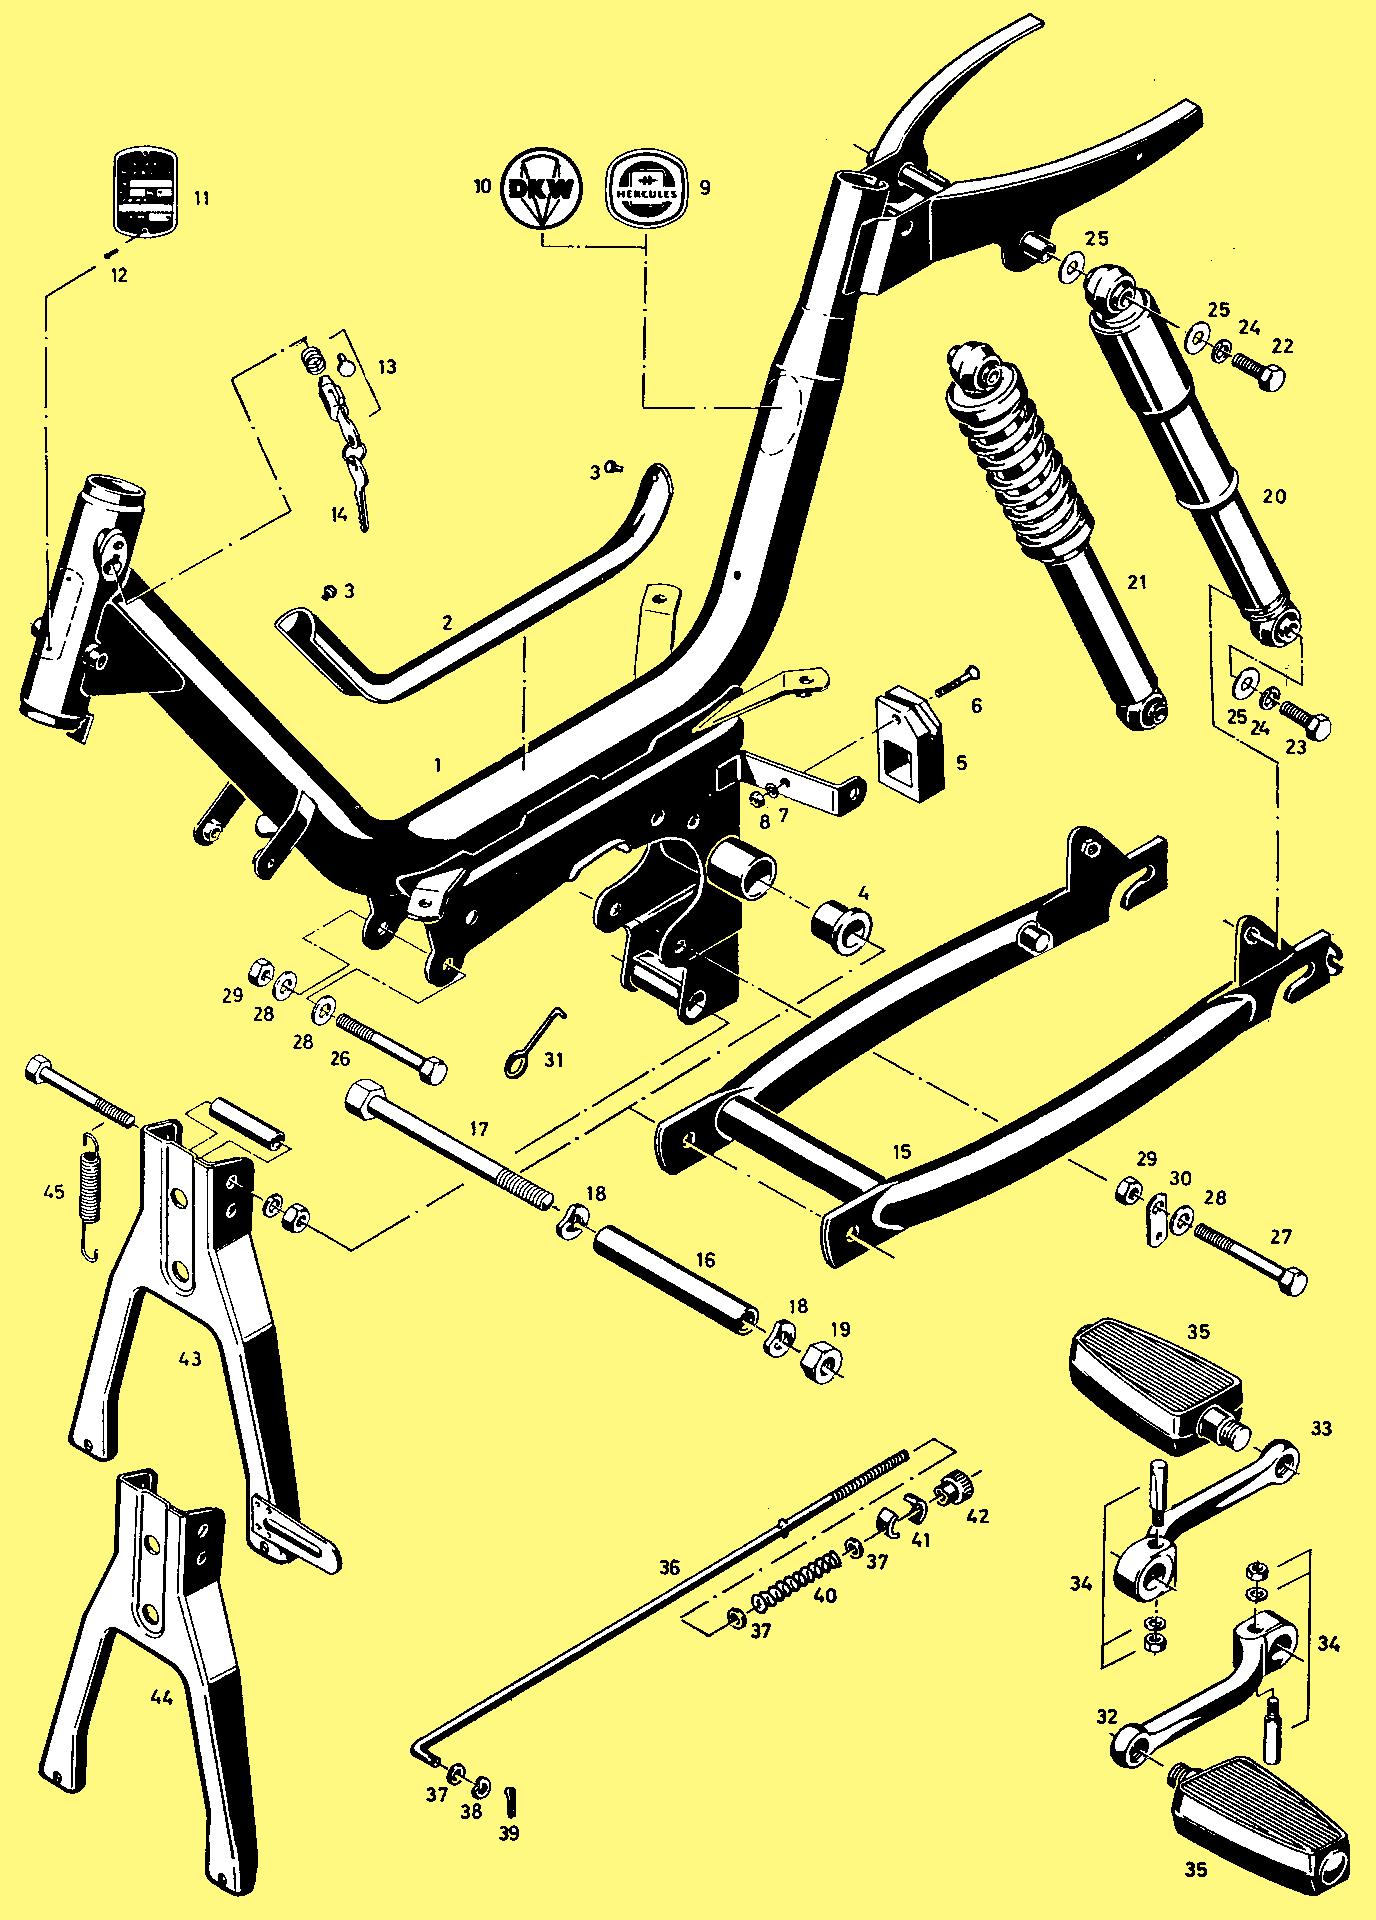 Hercules 2000 Wiring Diagram Schematic Diagrams 2080 Lathe Parts Myrons Mopeds Circuit